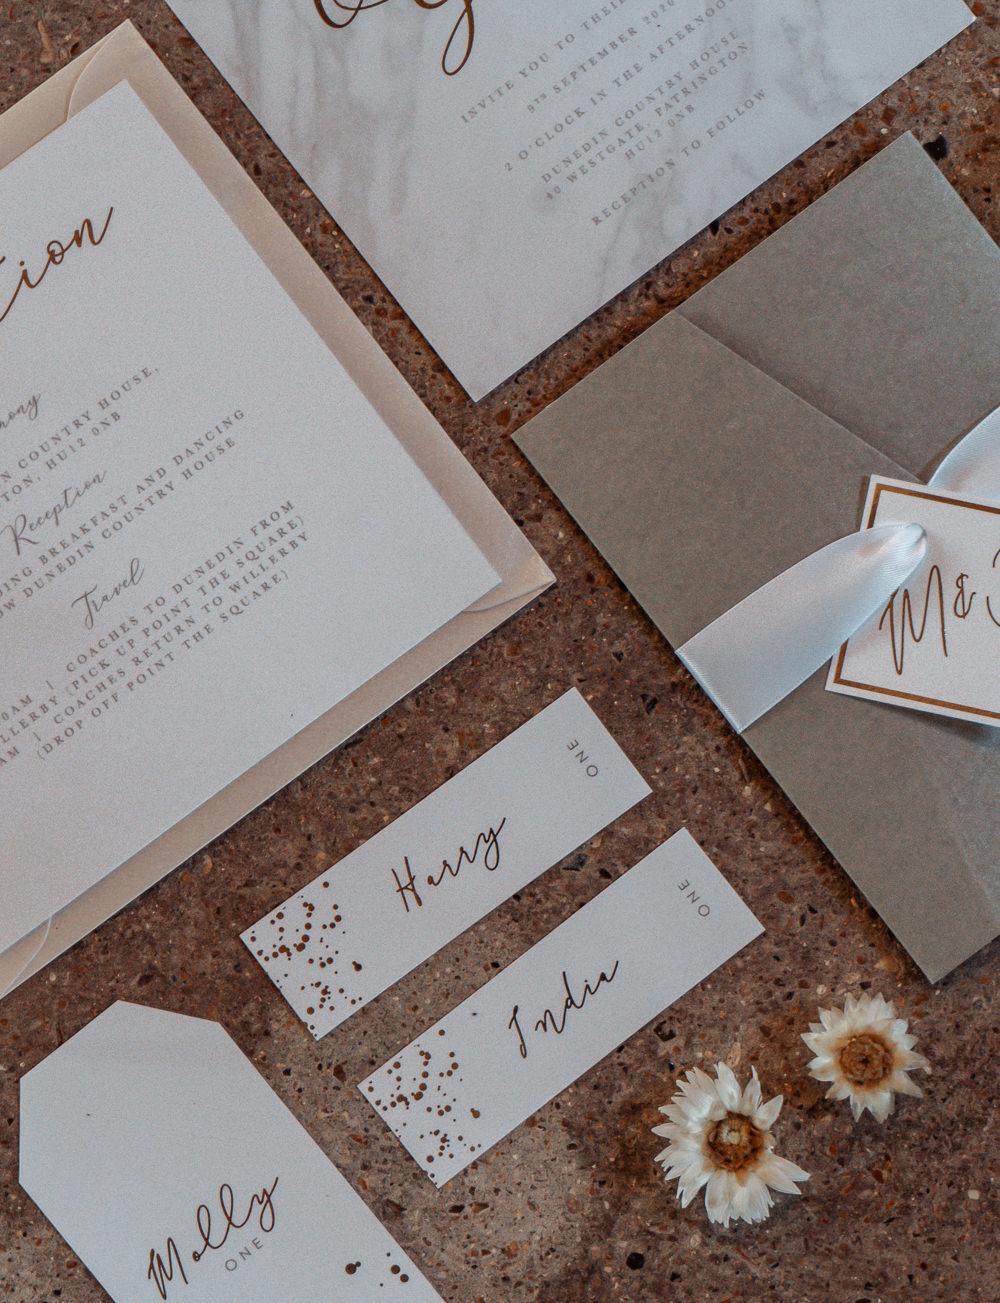 Stationery Invite Invitations Grey Splatter Calligraphy Intimate Wedding Ideas Imogen Eve Photography